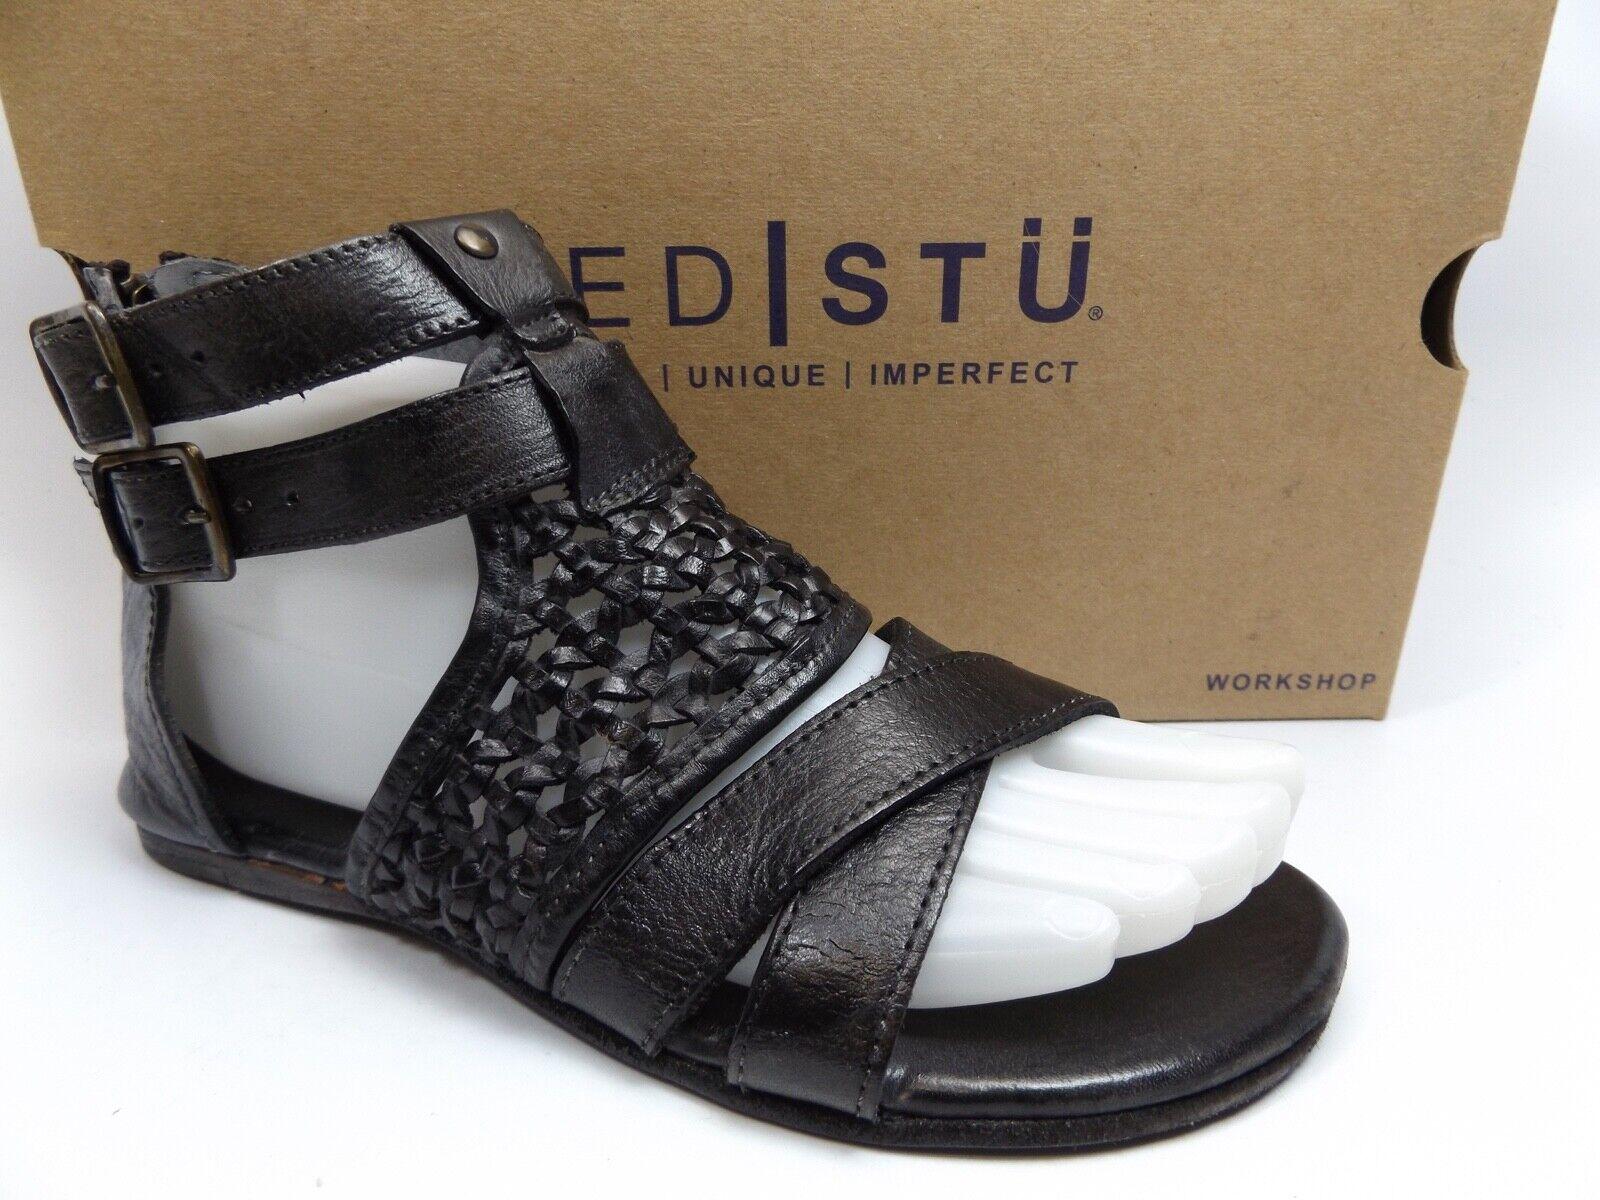 Cama STU capriana con Tiras Gladiador Mujer Sandalia Negro Dip Dye M NUEVO  39